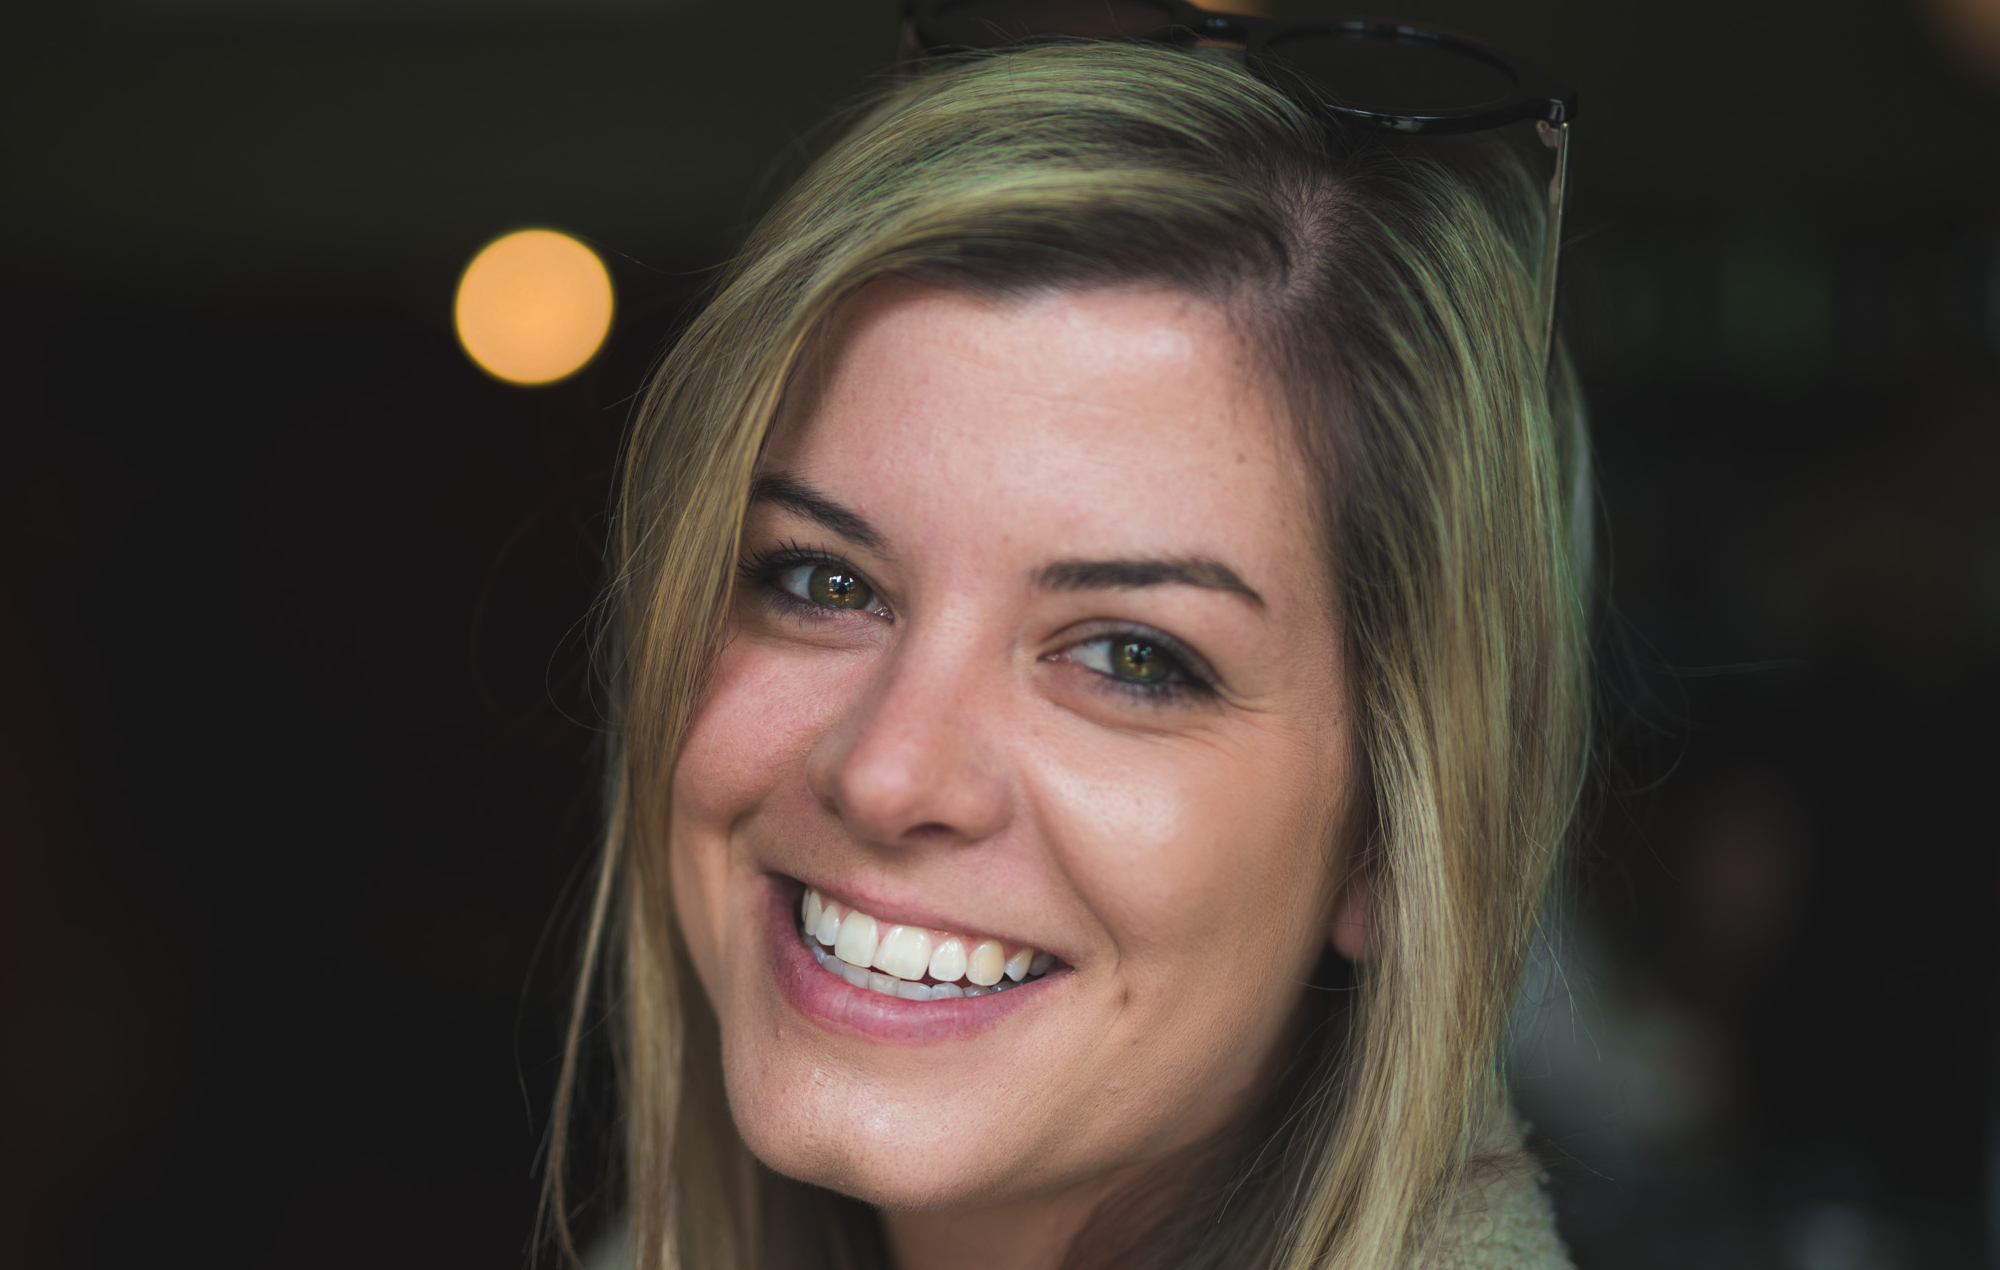 Charlotte Abroms on how the coronavirus has impacted her career